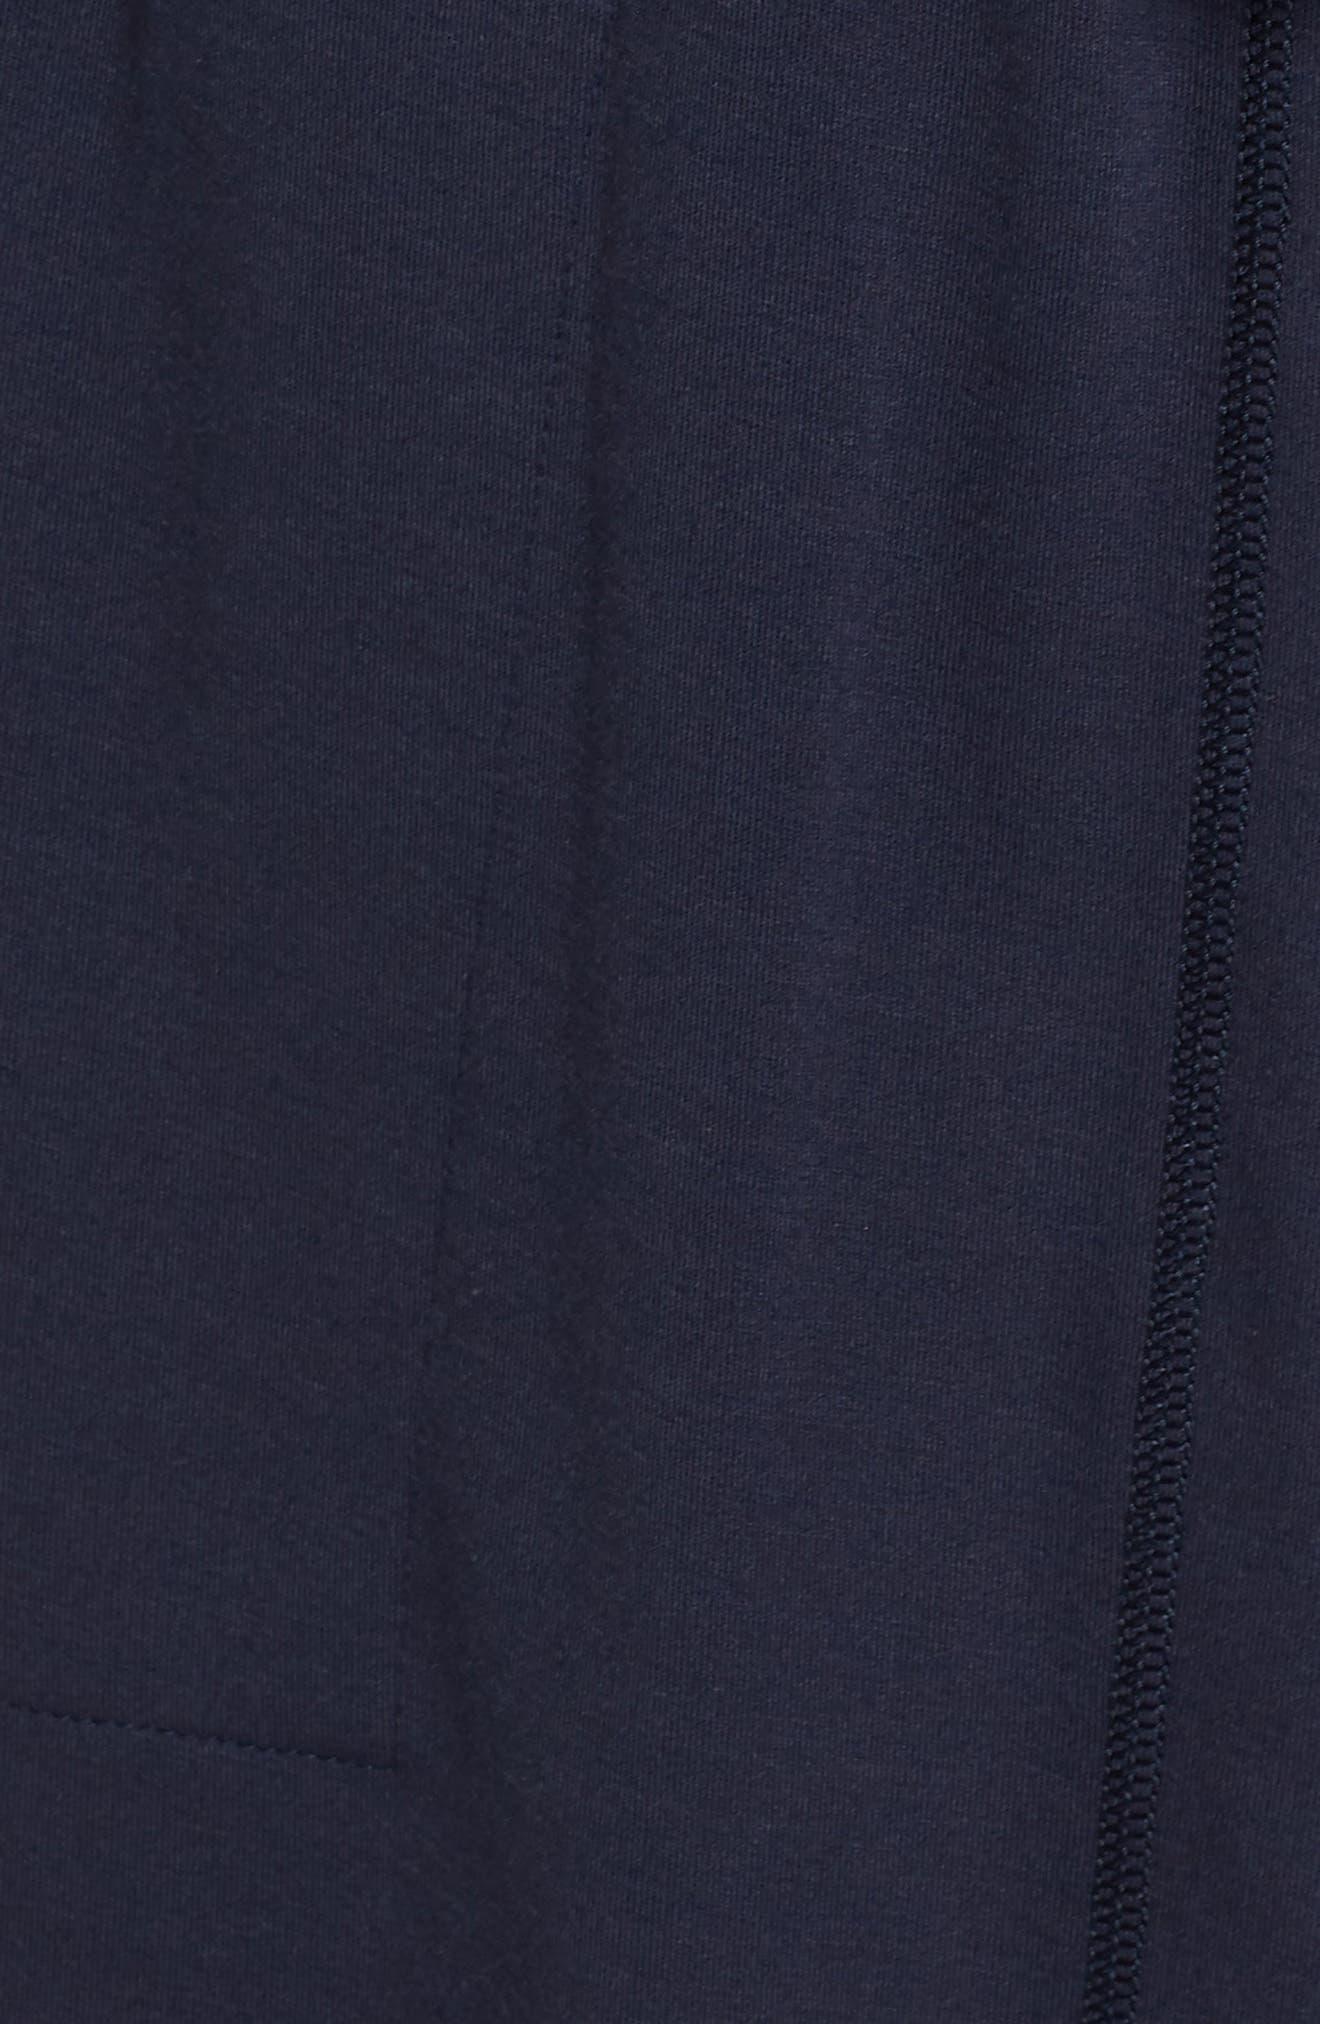 NATORI, Naya Short Robe, Alternate thumbnail 5, color, NIGHT BLUE